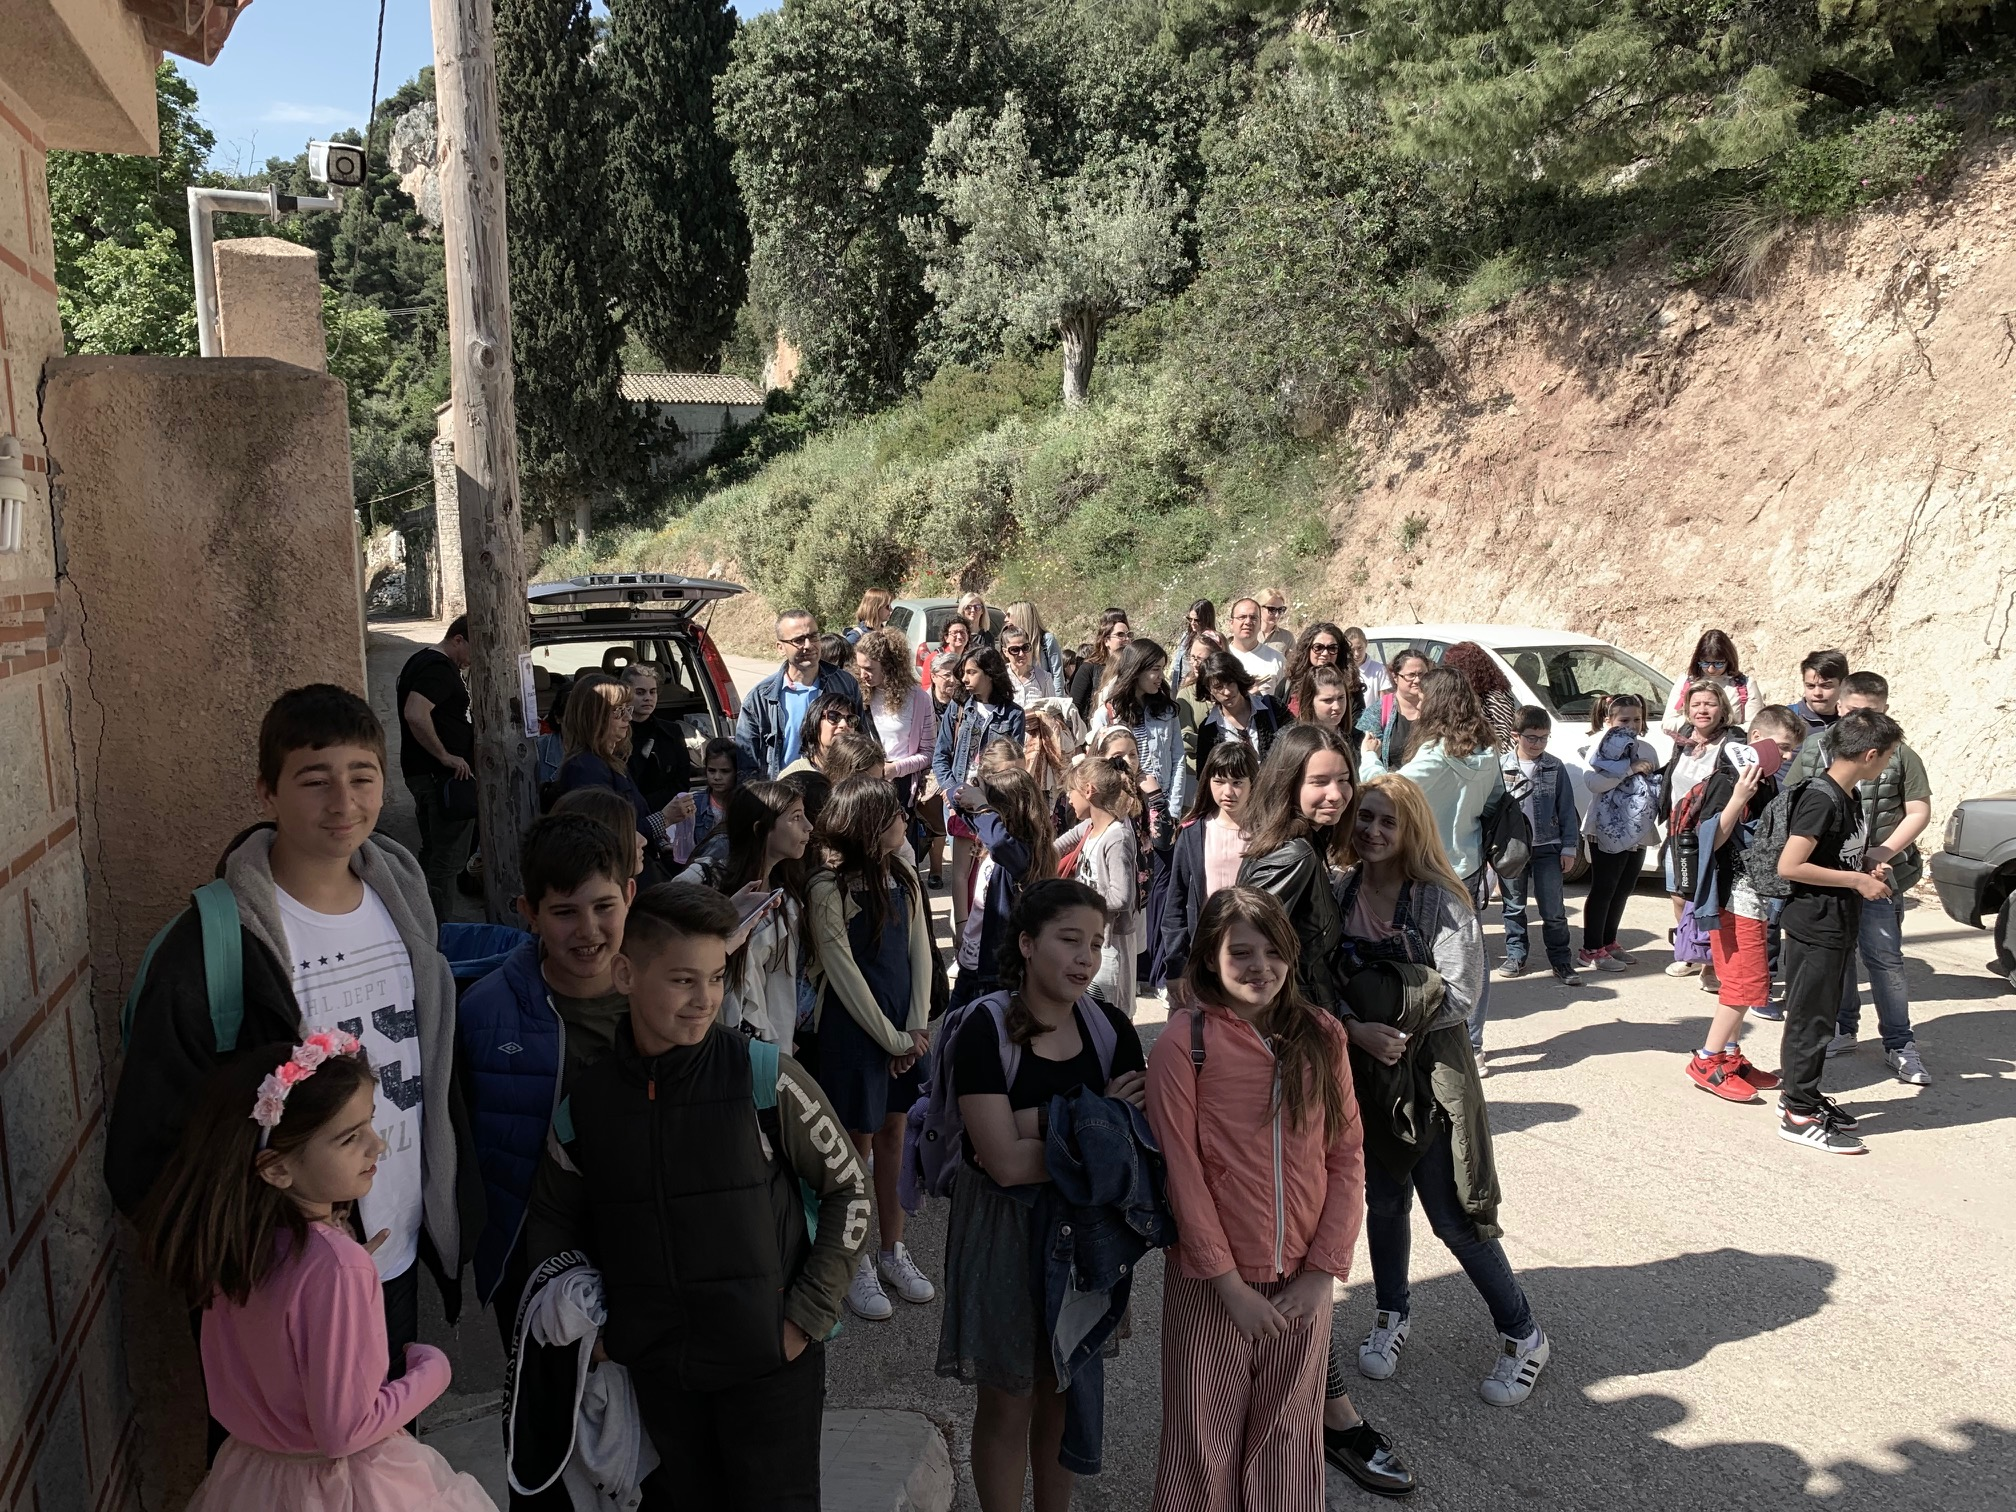 Eκδρομή λήξεως σχολικής χρονιάς των Κατηχητικών συντροφιών Ενορίας Αγίου Γεωργίου Νέας Περάμου